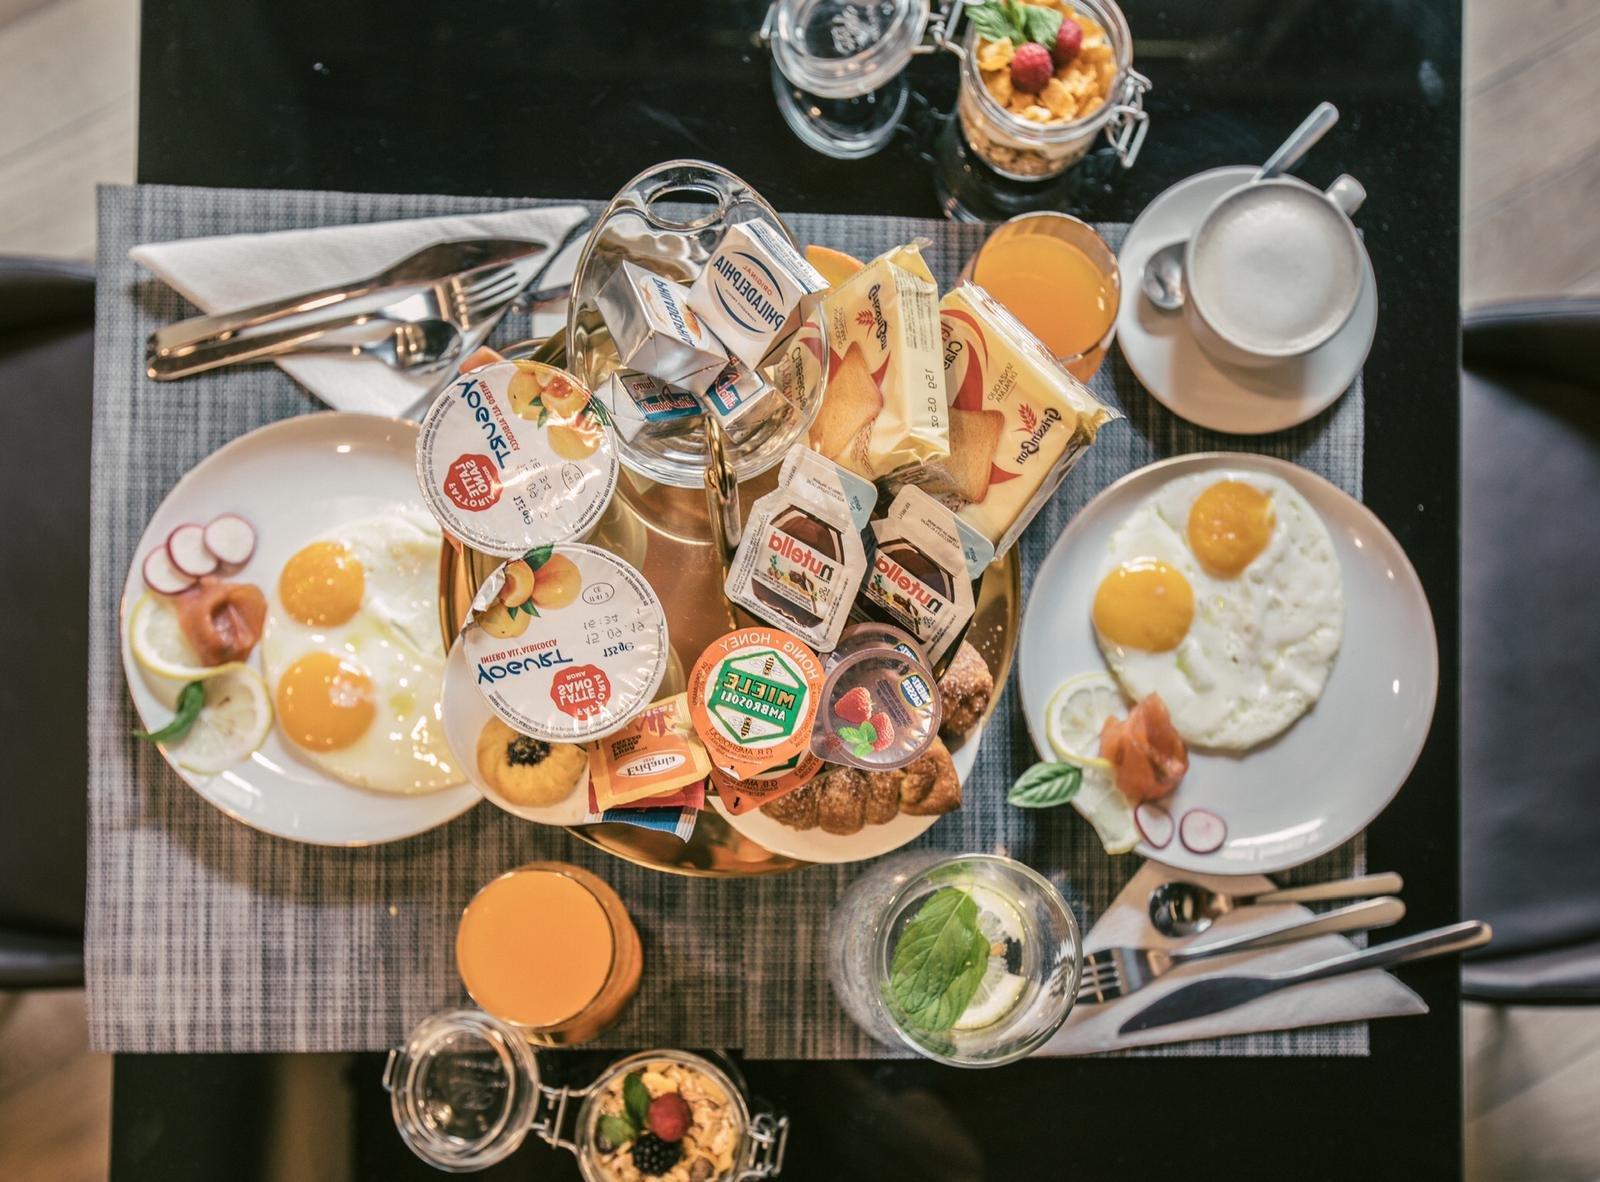 NEMAN Maison Experience - ארוחת בוקר כשרה ברומא